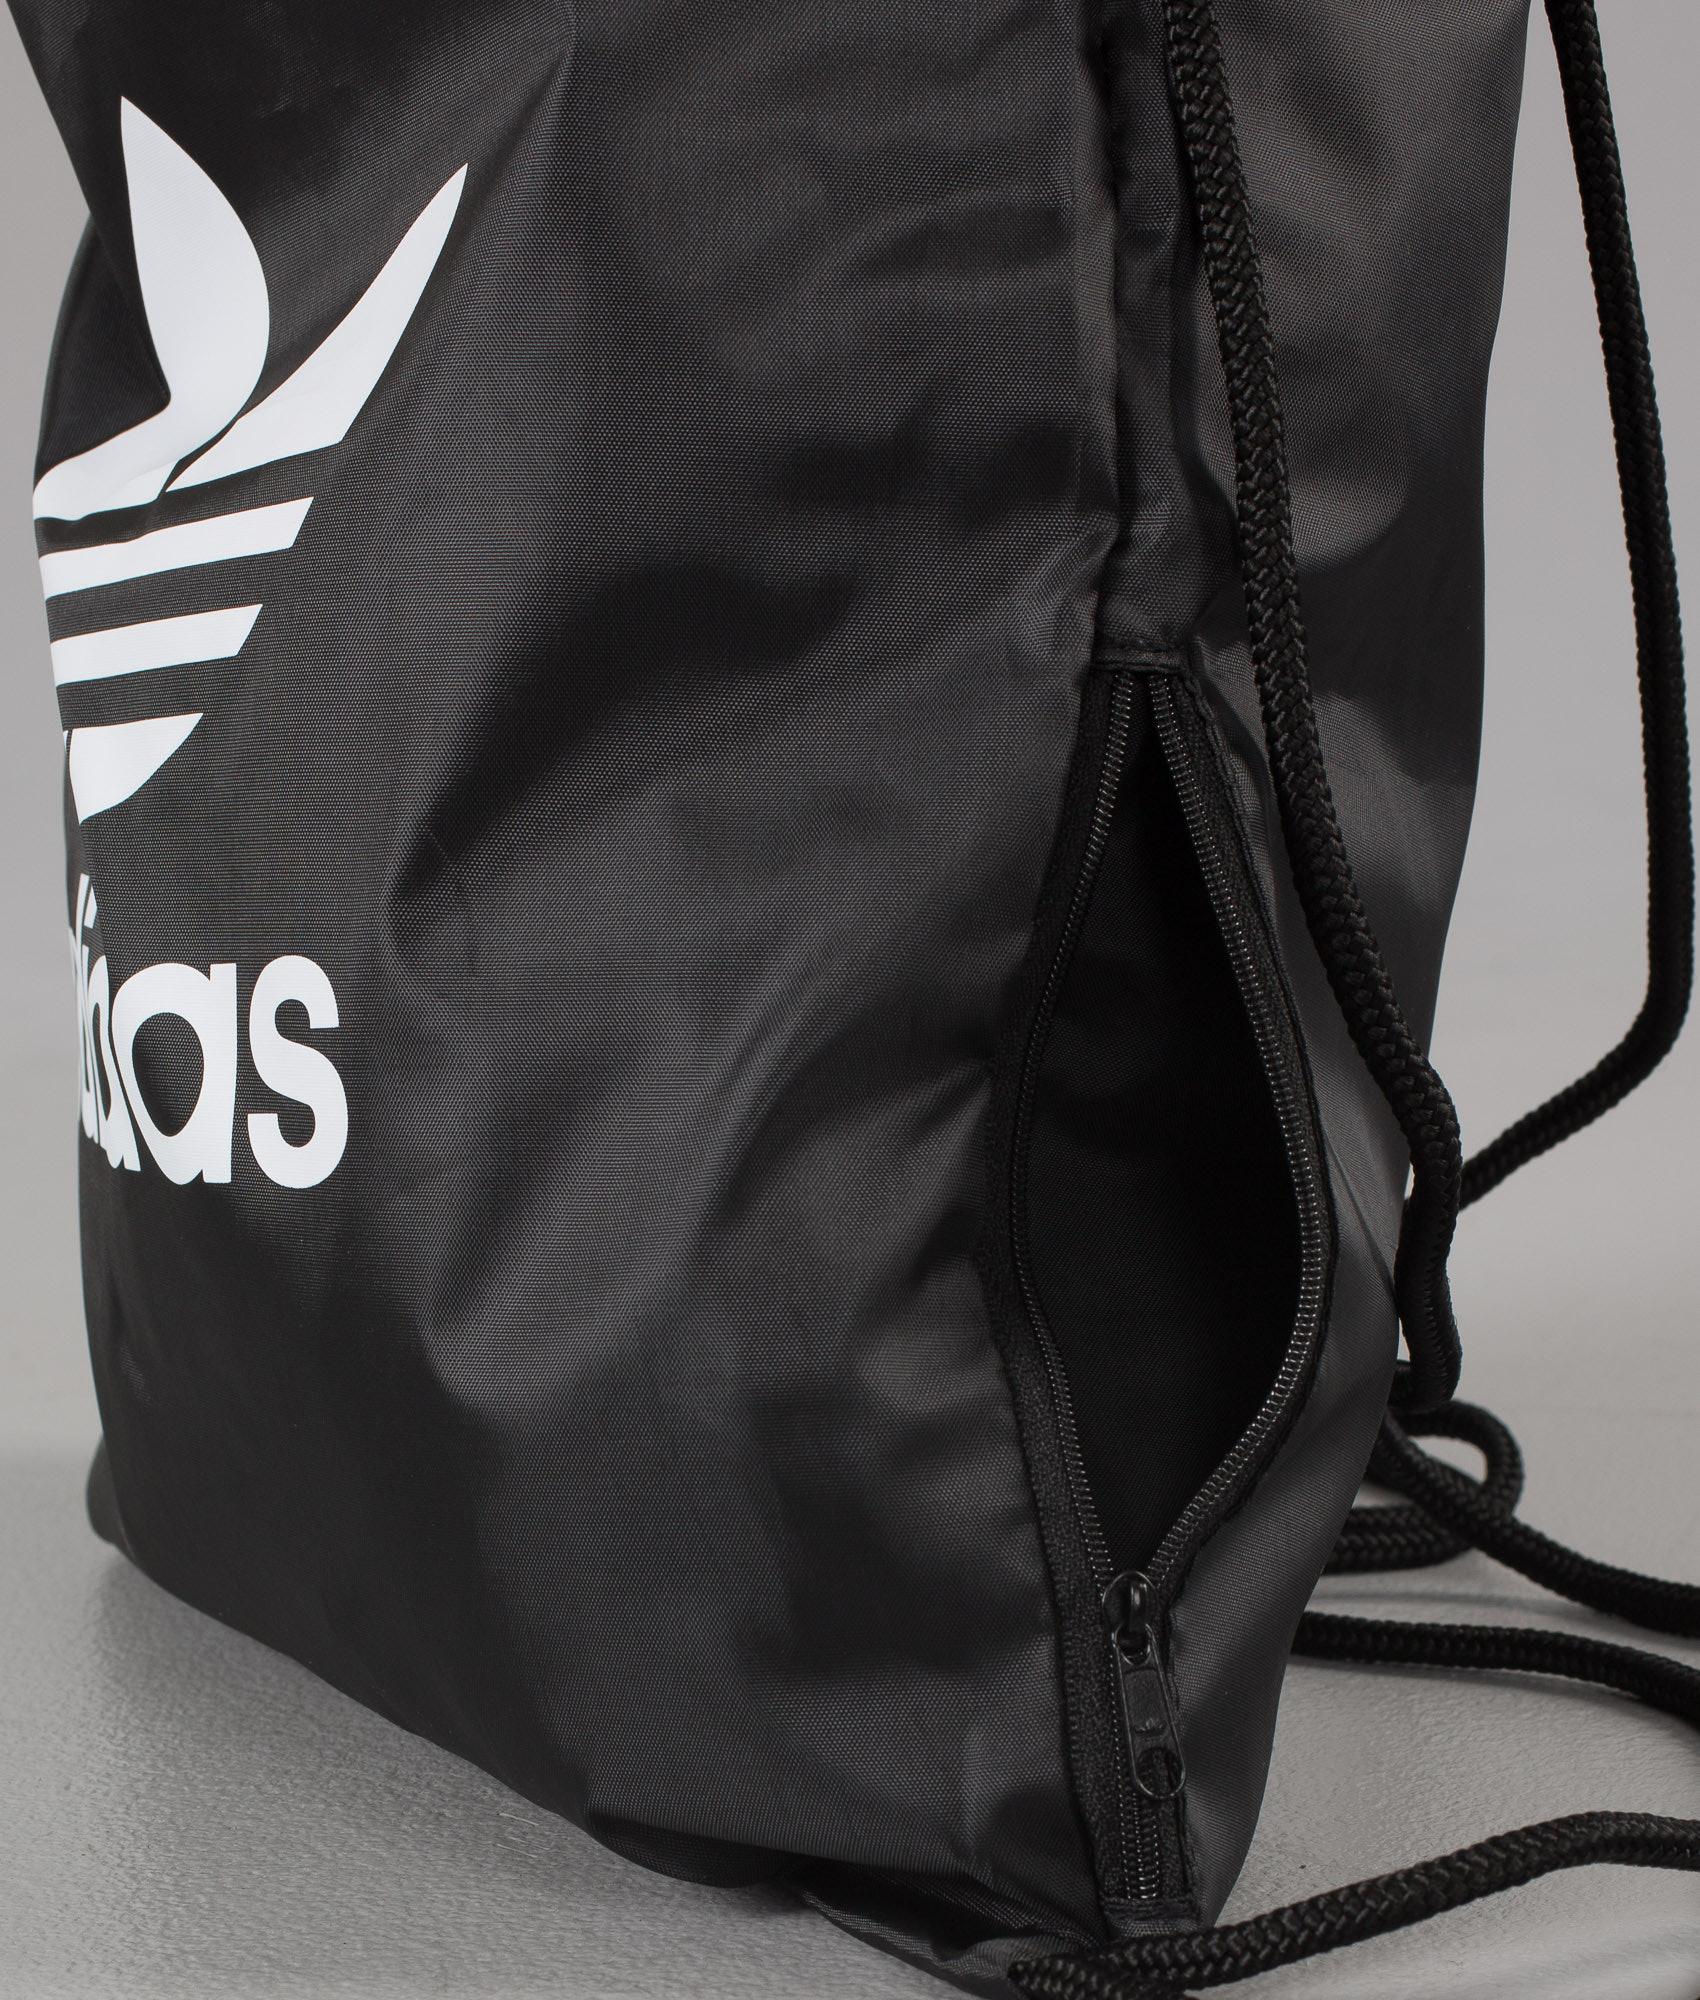 5e3cb80d12 Adidas Originals Gymsack Trefoil Zaino Black - Ridestore.it